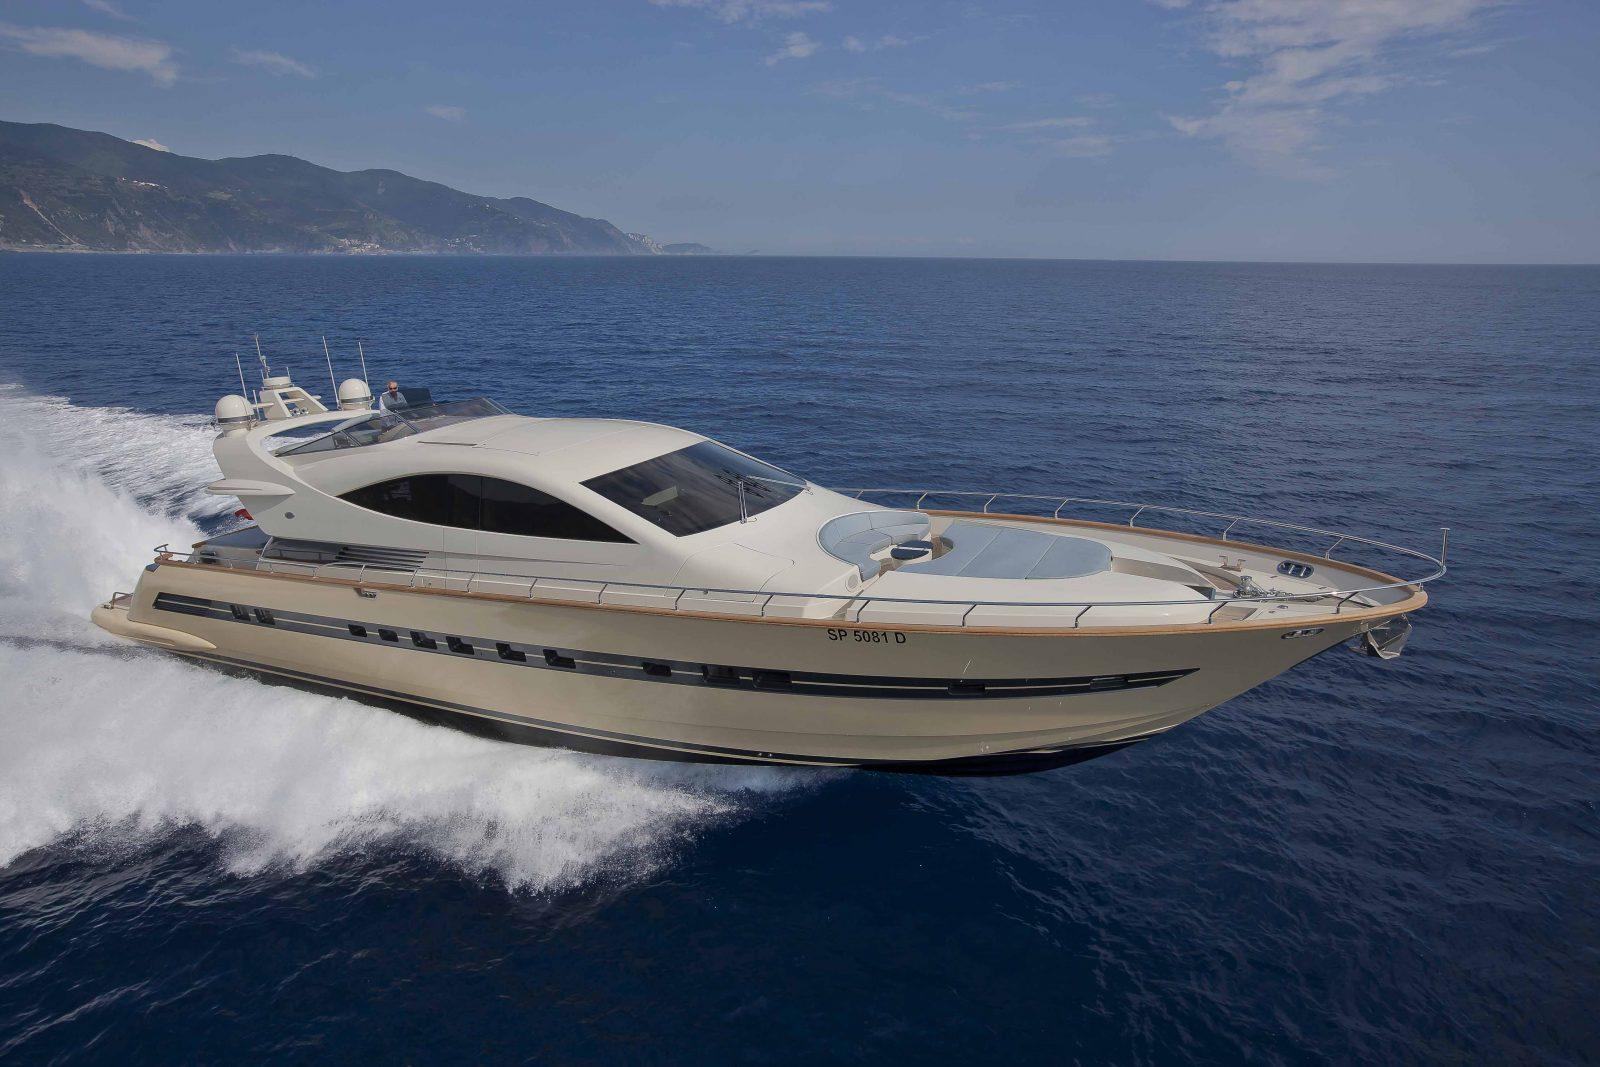 Luxury yacht for Sale | Cerri 86 by CCN - Cerri Cantieri Navali